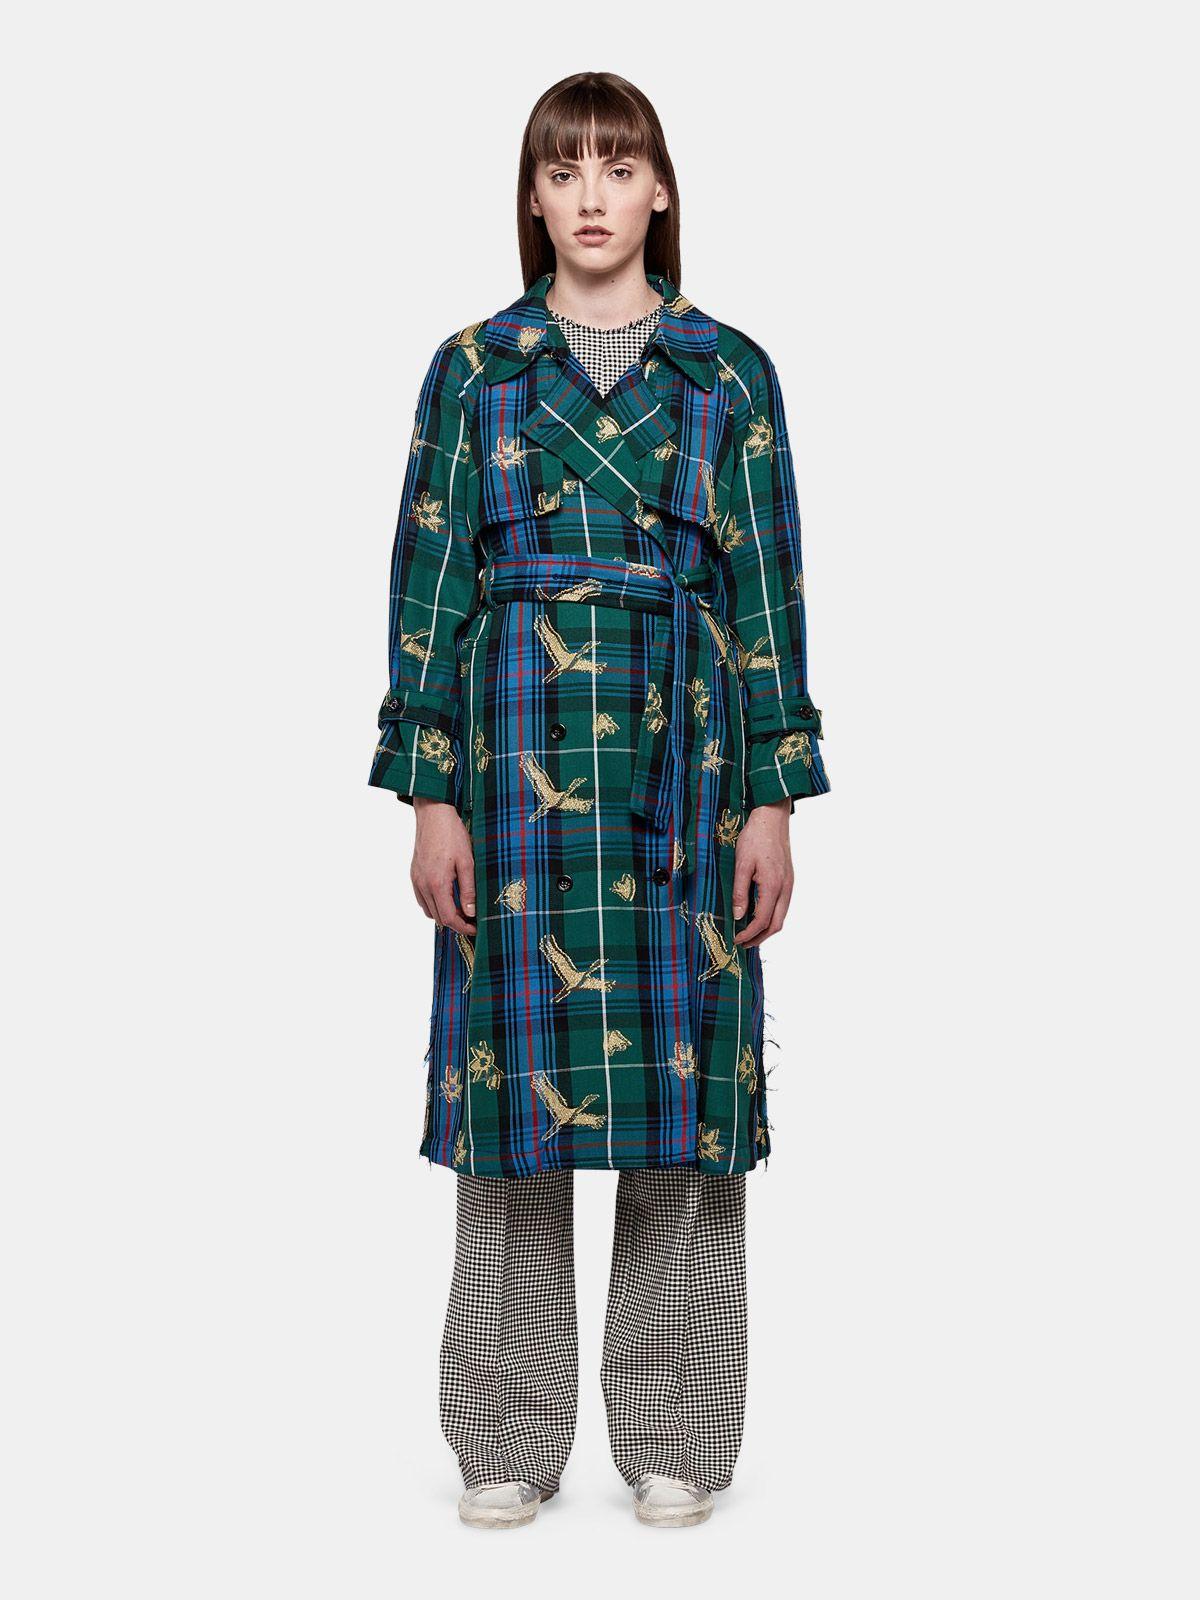 Golden Goose - Masami trenchcoat in tartan with jacquard plumetis patterns in